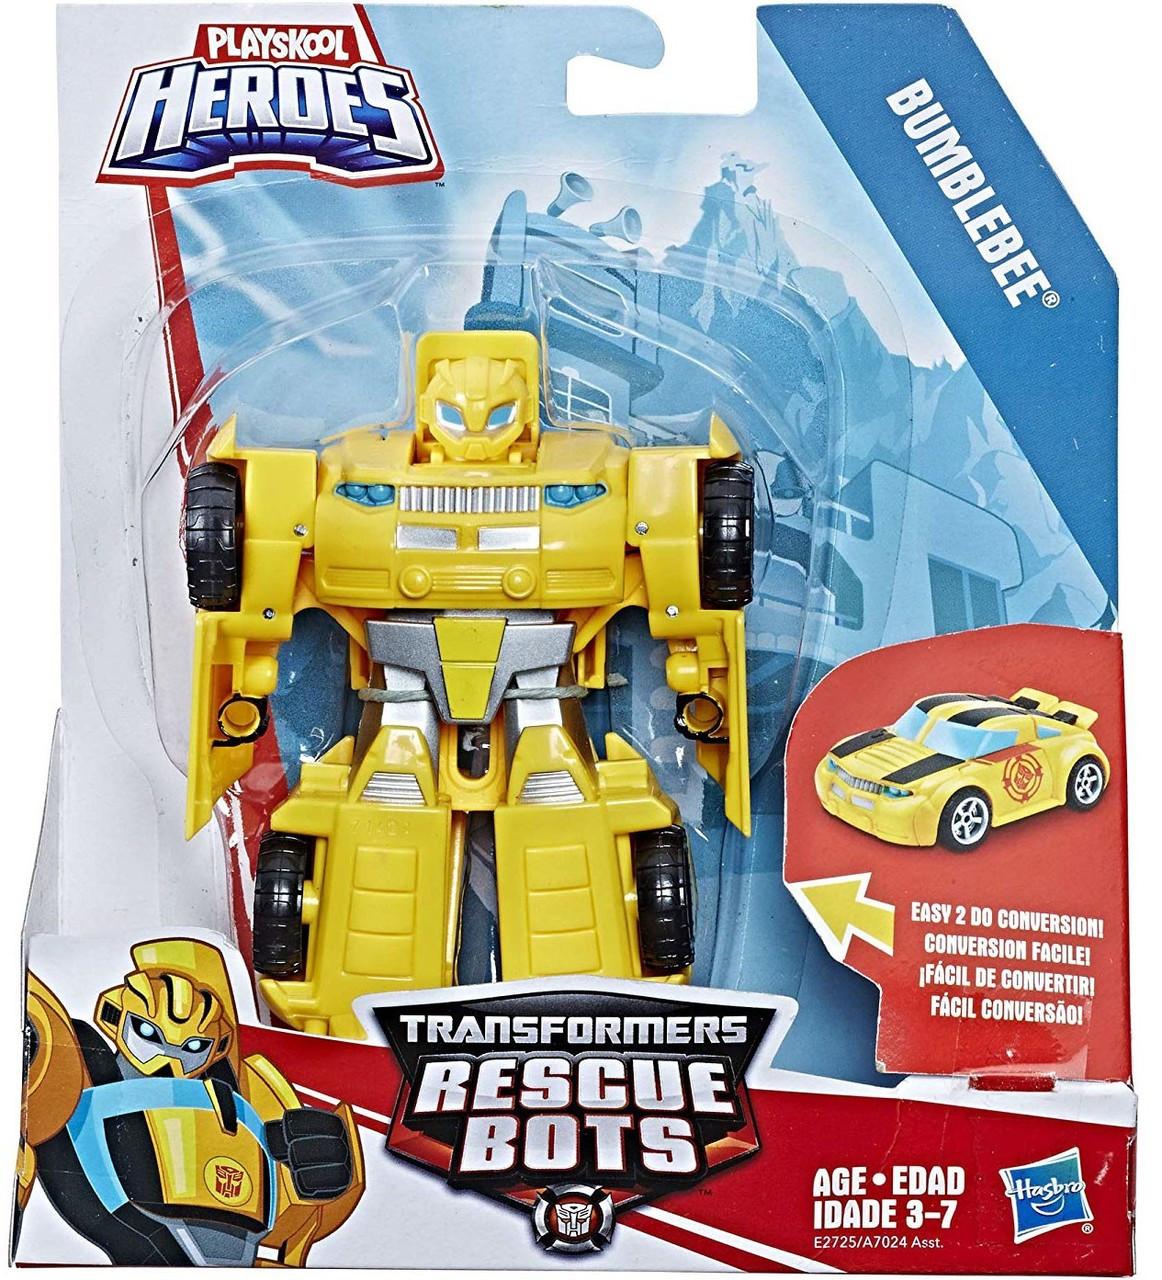 Playskool Heroes Transformers Rescue Bots Heatwave Race Car